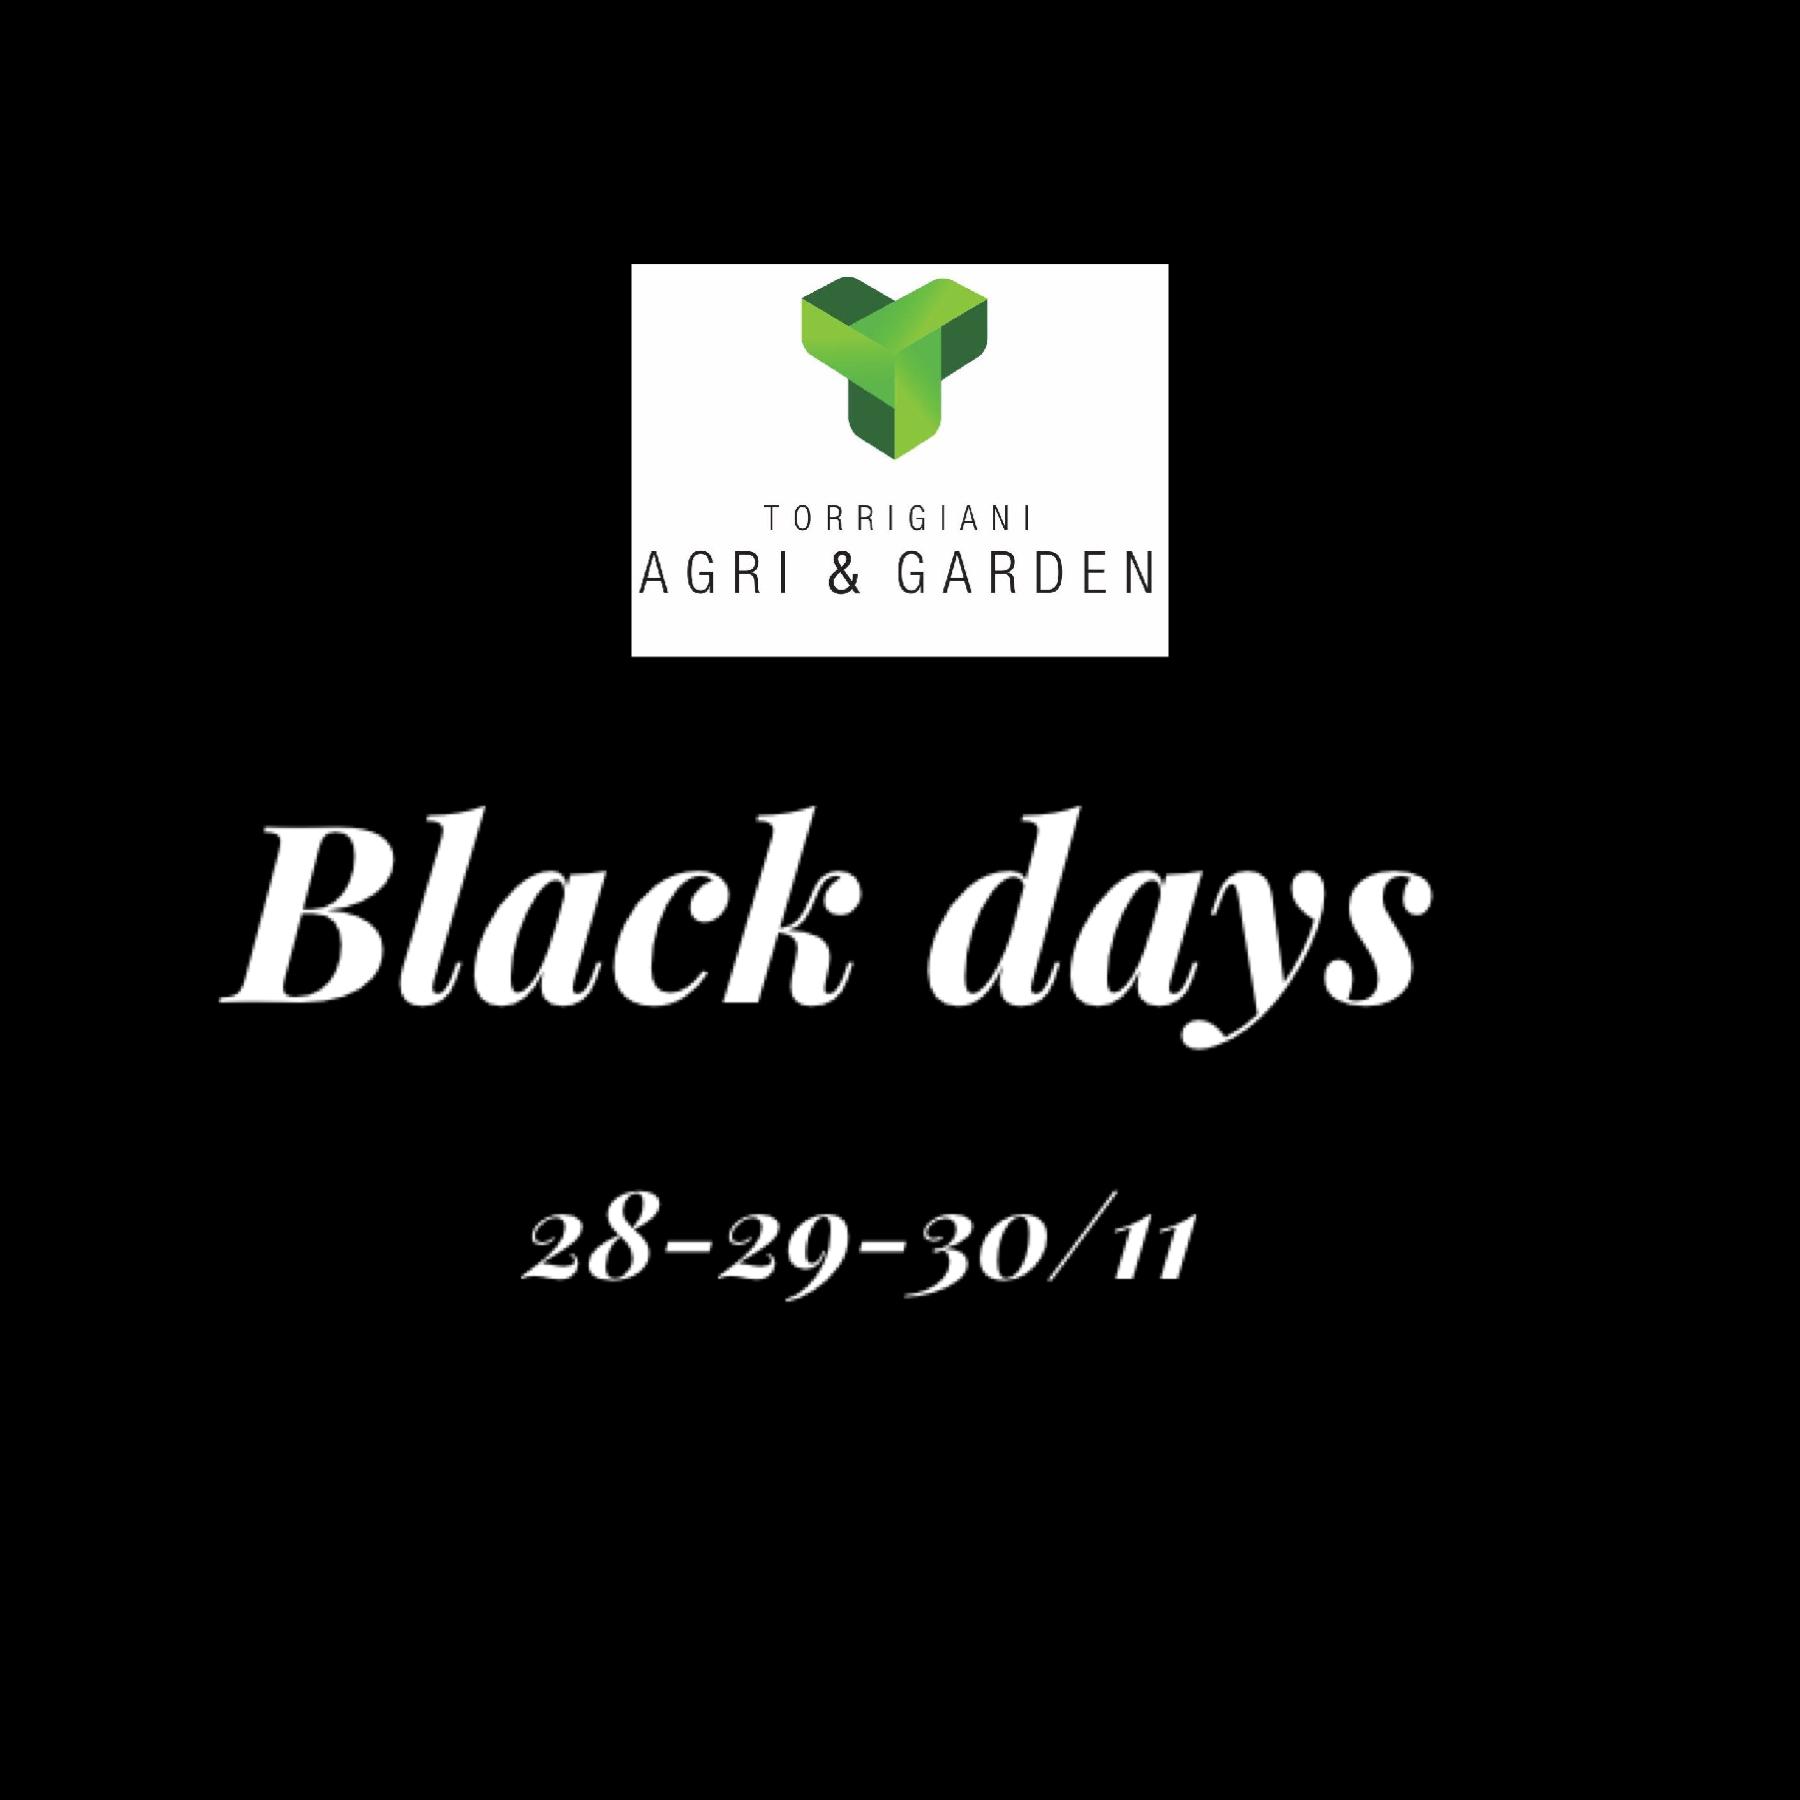 BLACK DAYS   Torrigiani Agri & Garden S.r.l.